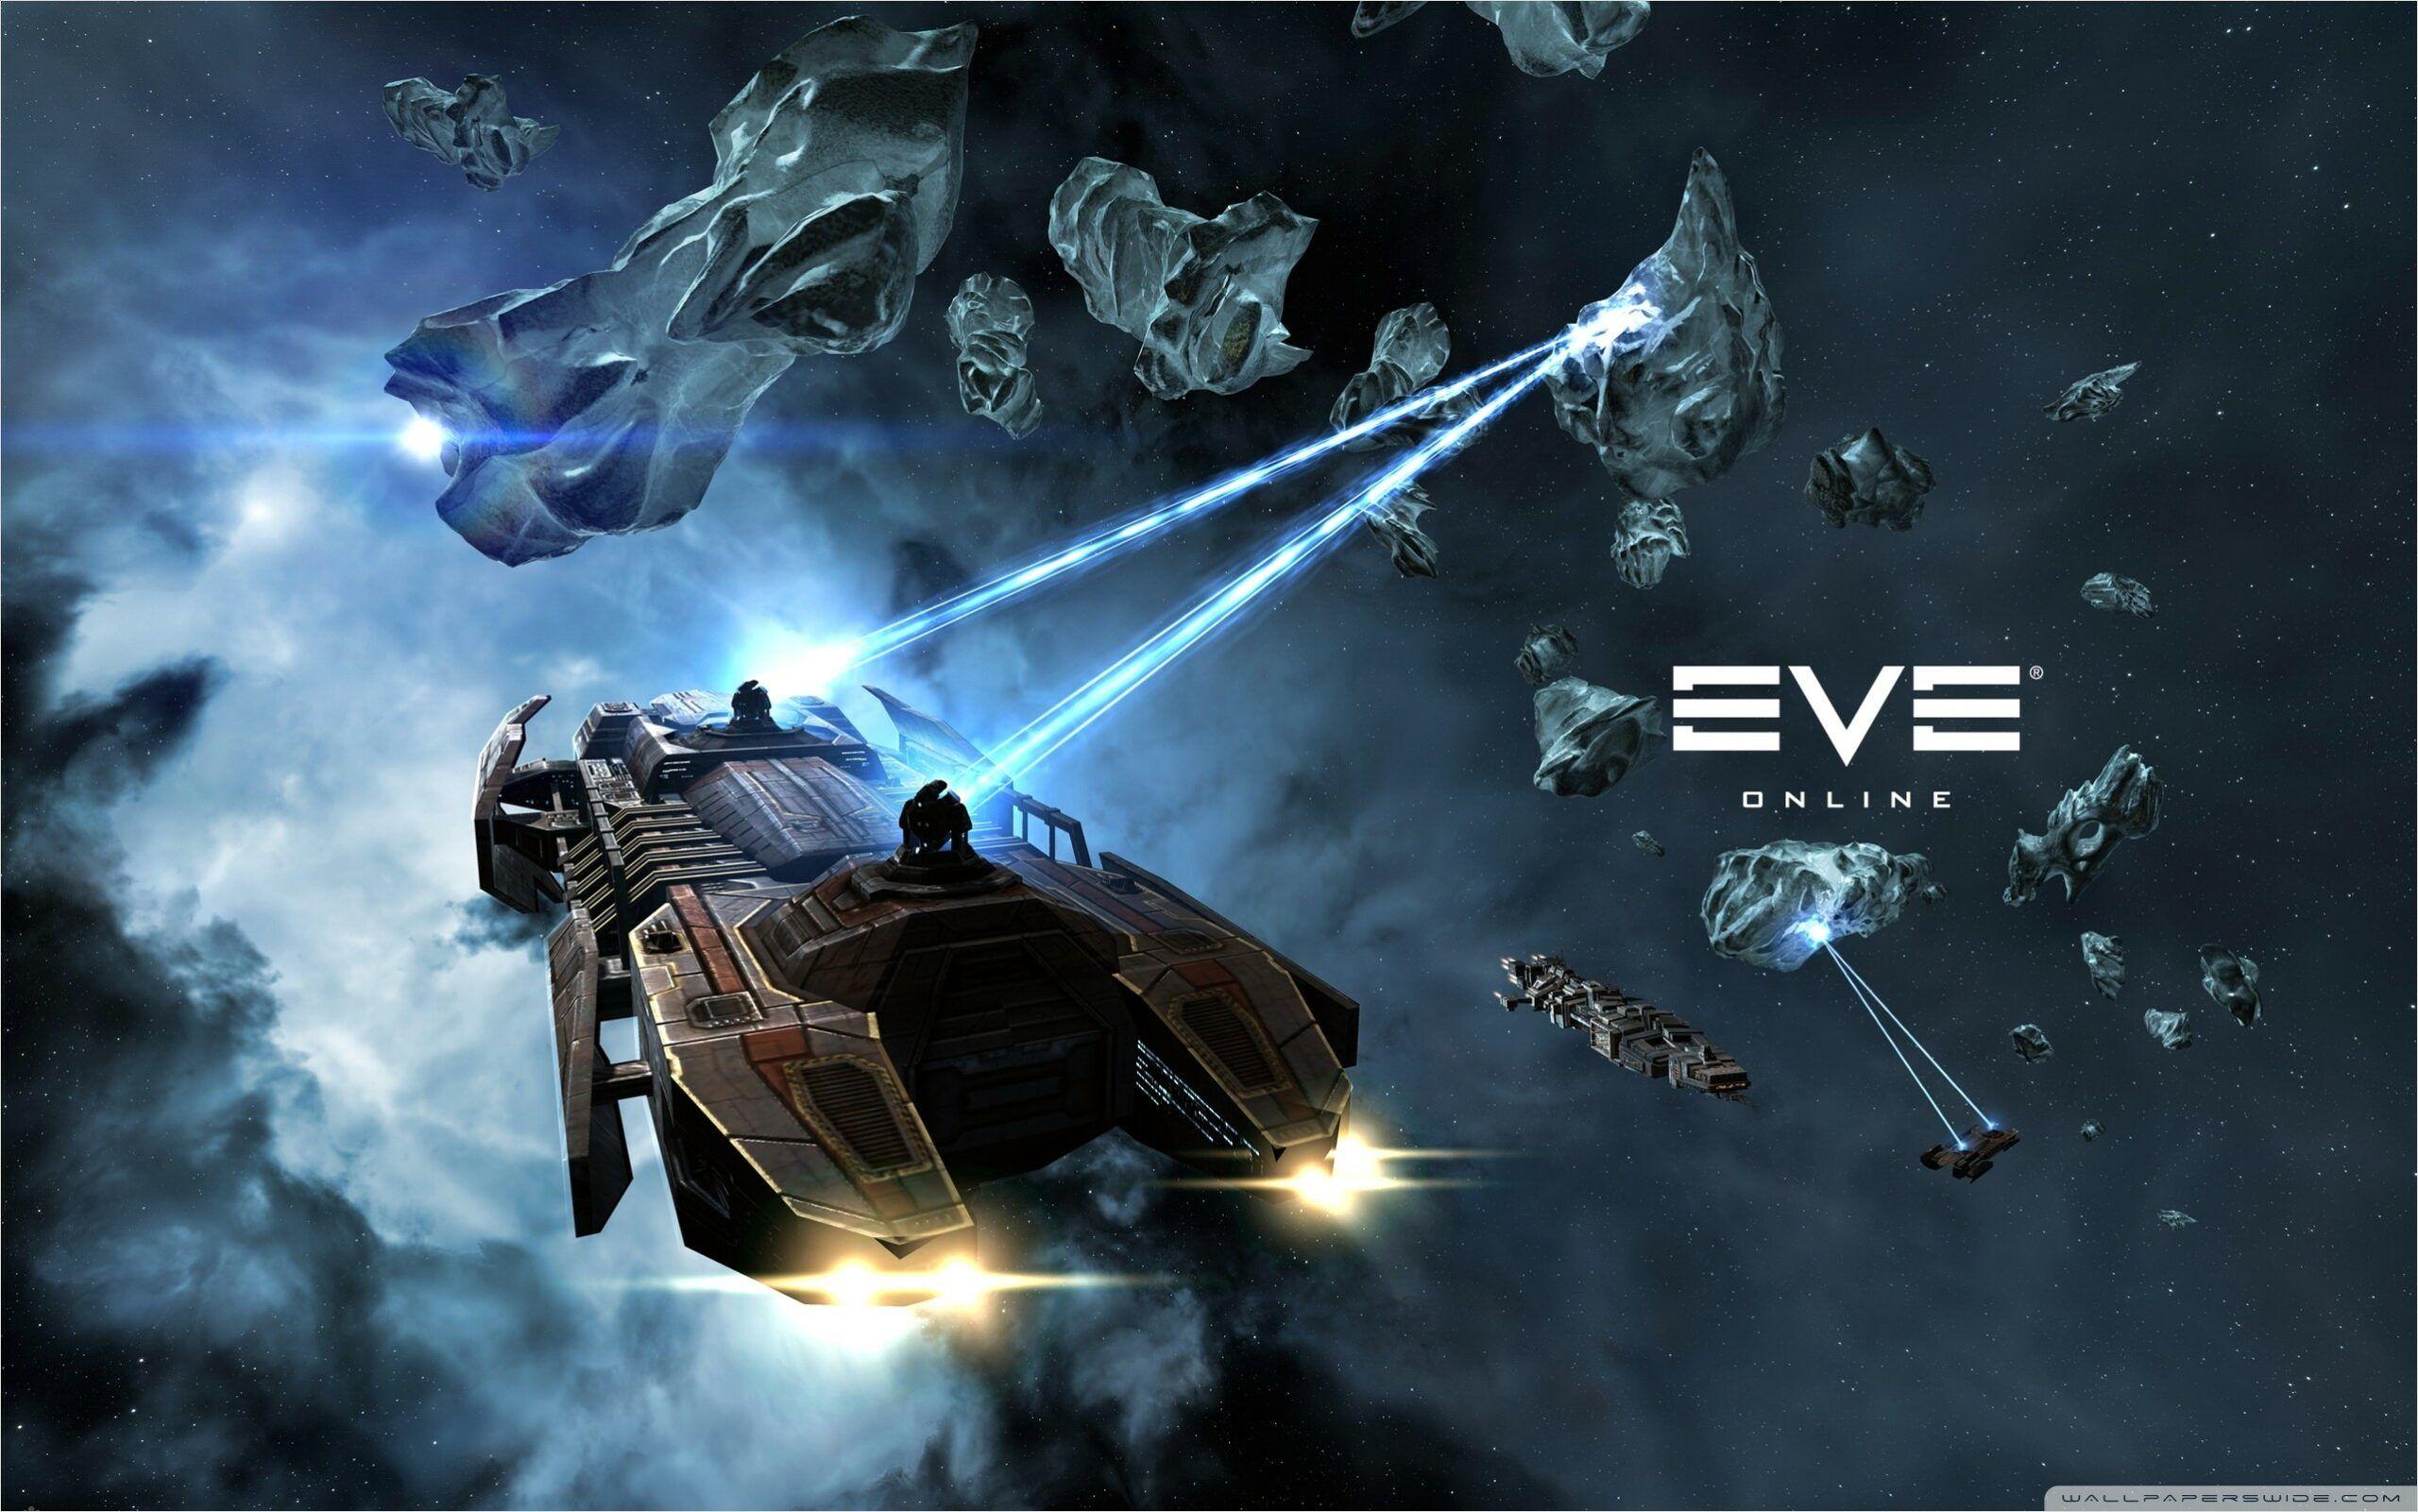 4k Uhd Eve Online Wallpaper In 2020 Eve Online Wallpaper Online Play Free Online